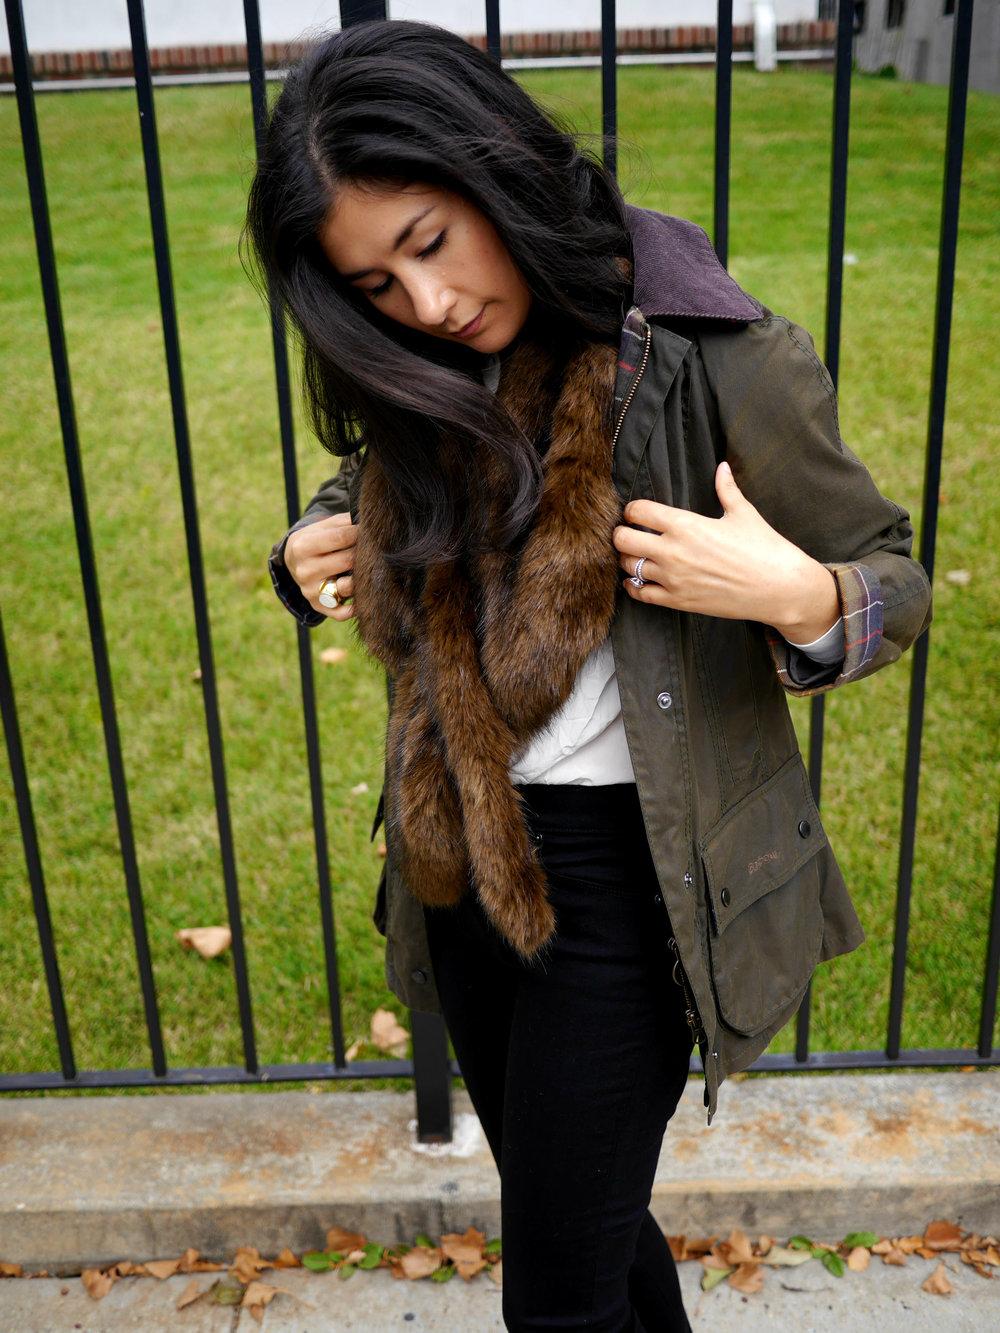 Barbour Jacket LOFT Skinny Jeans Gucci Loafers